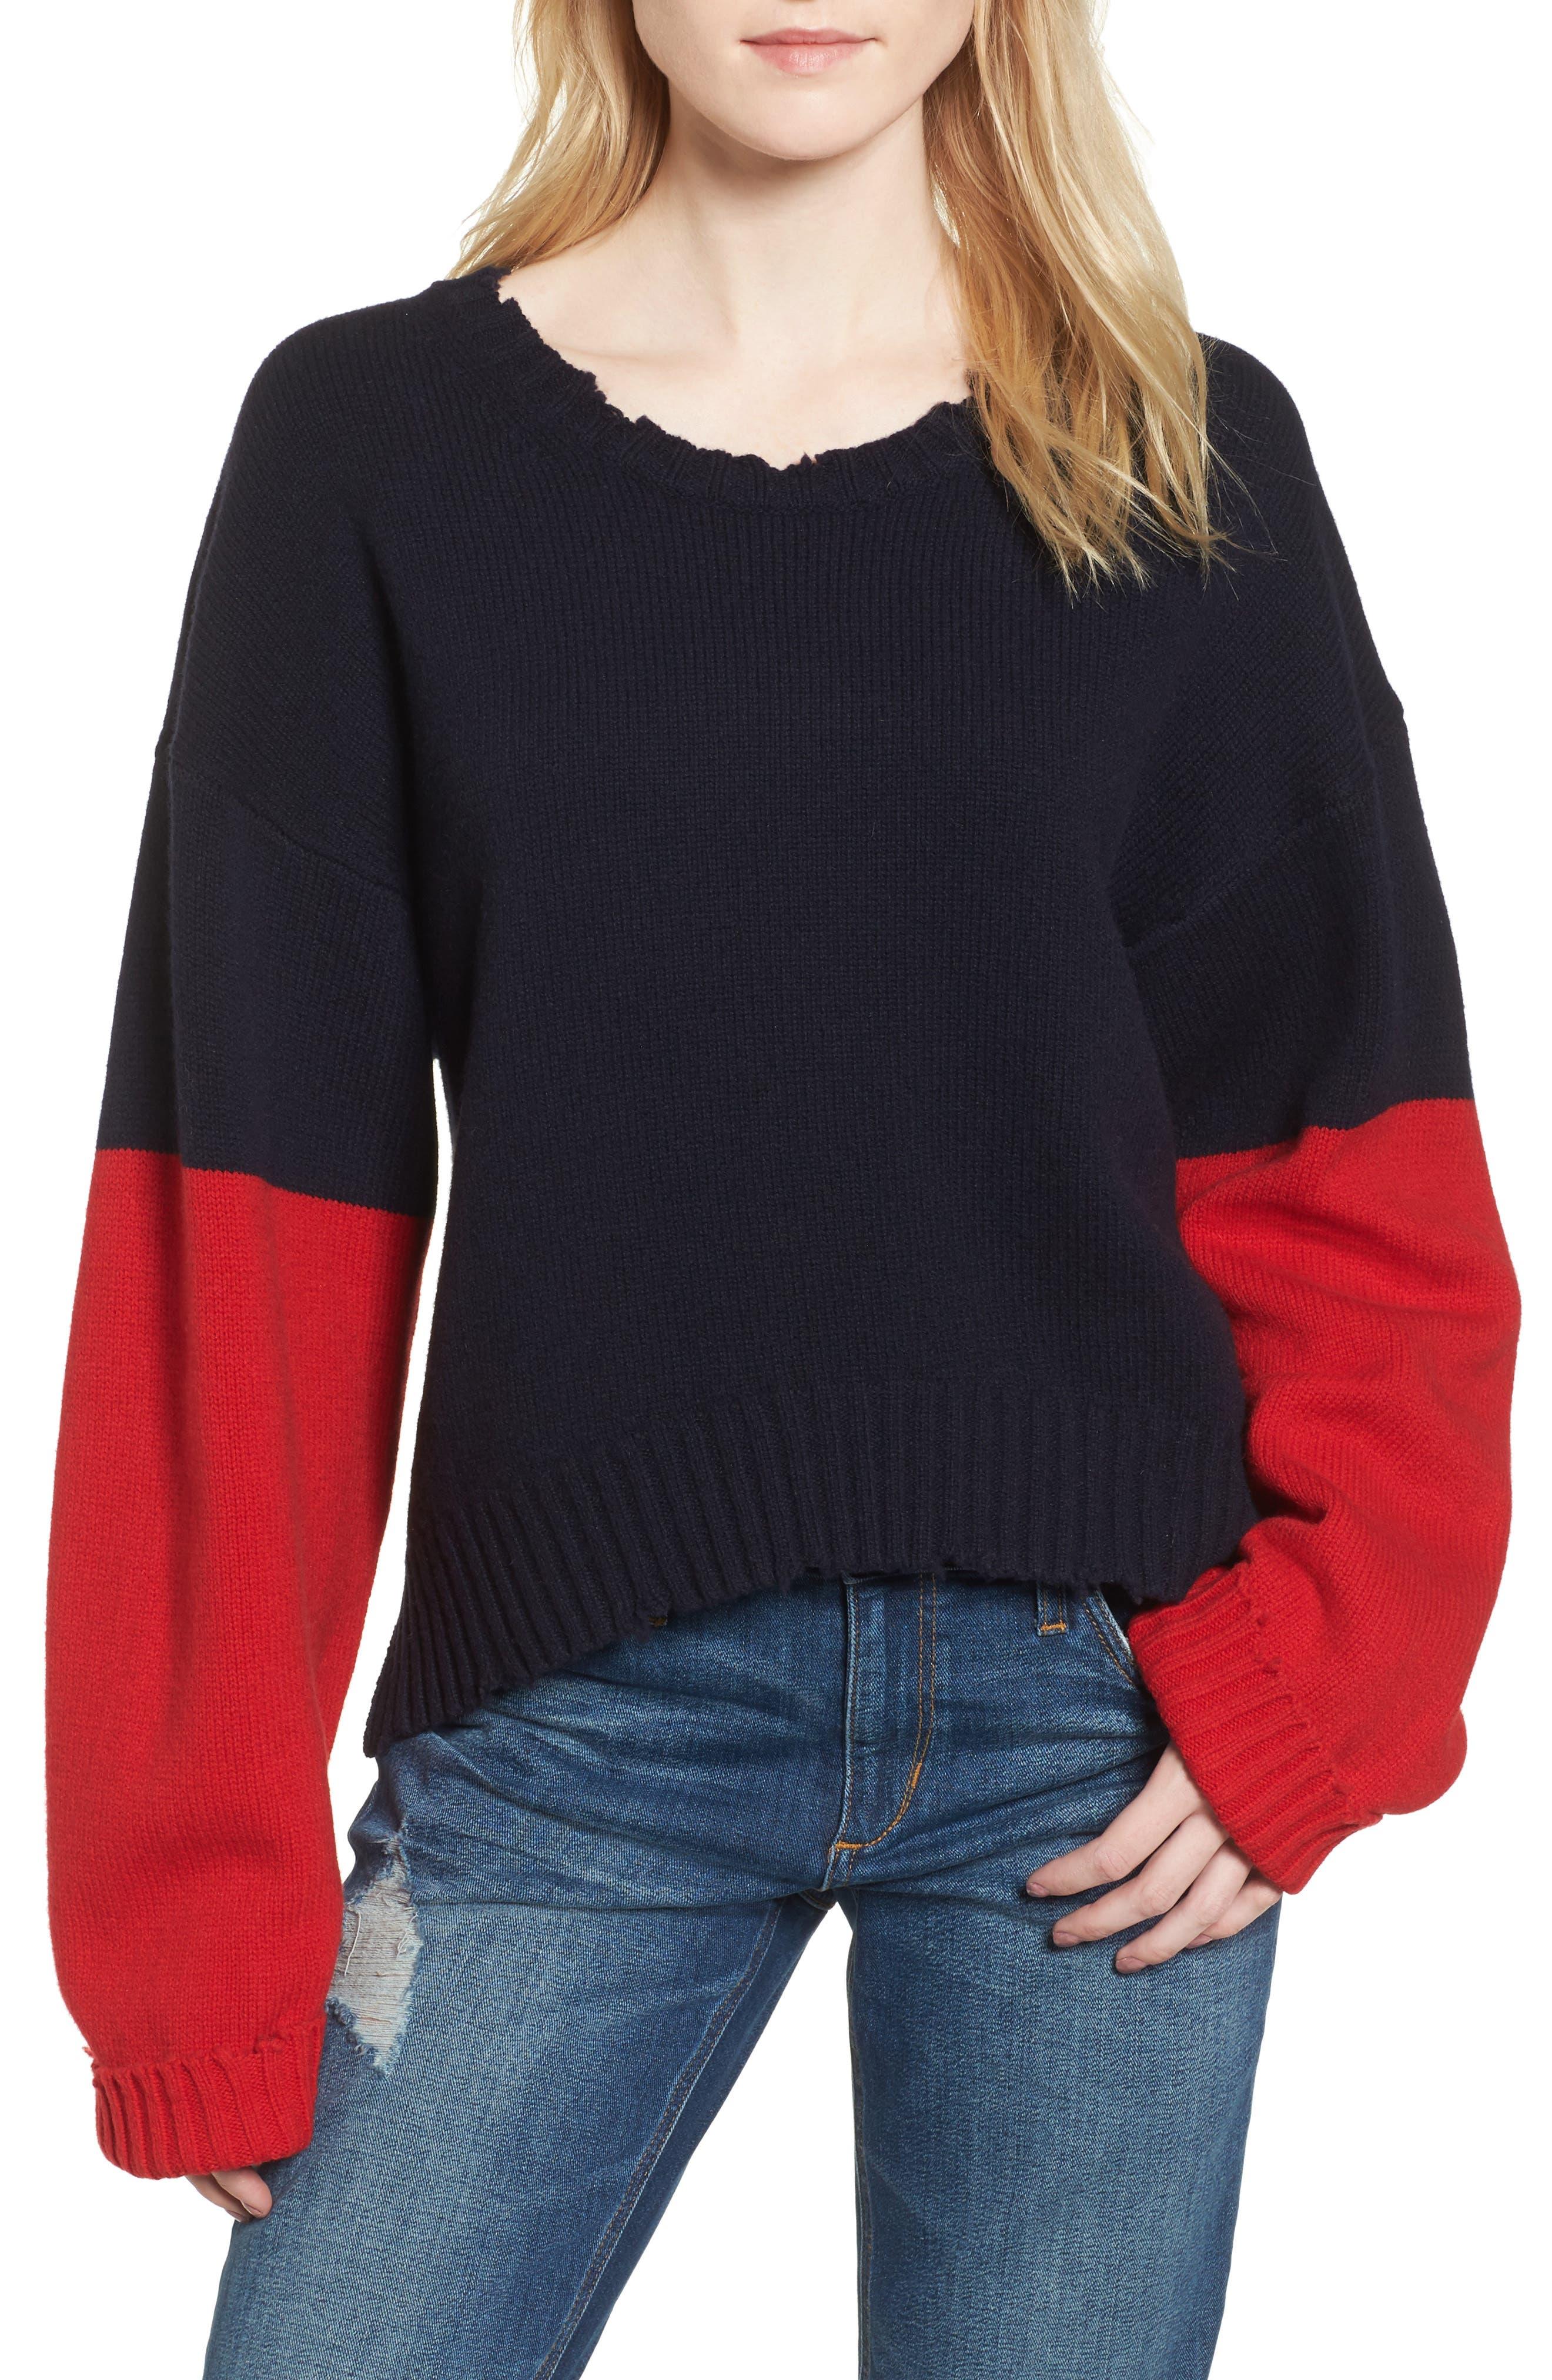 Image of Zadig & Voltaire Clarys Colorblock Merino Wool Sweater